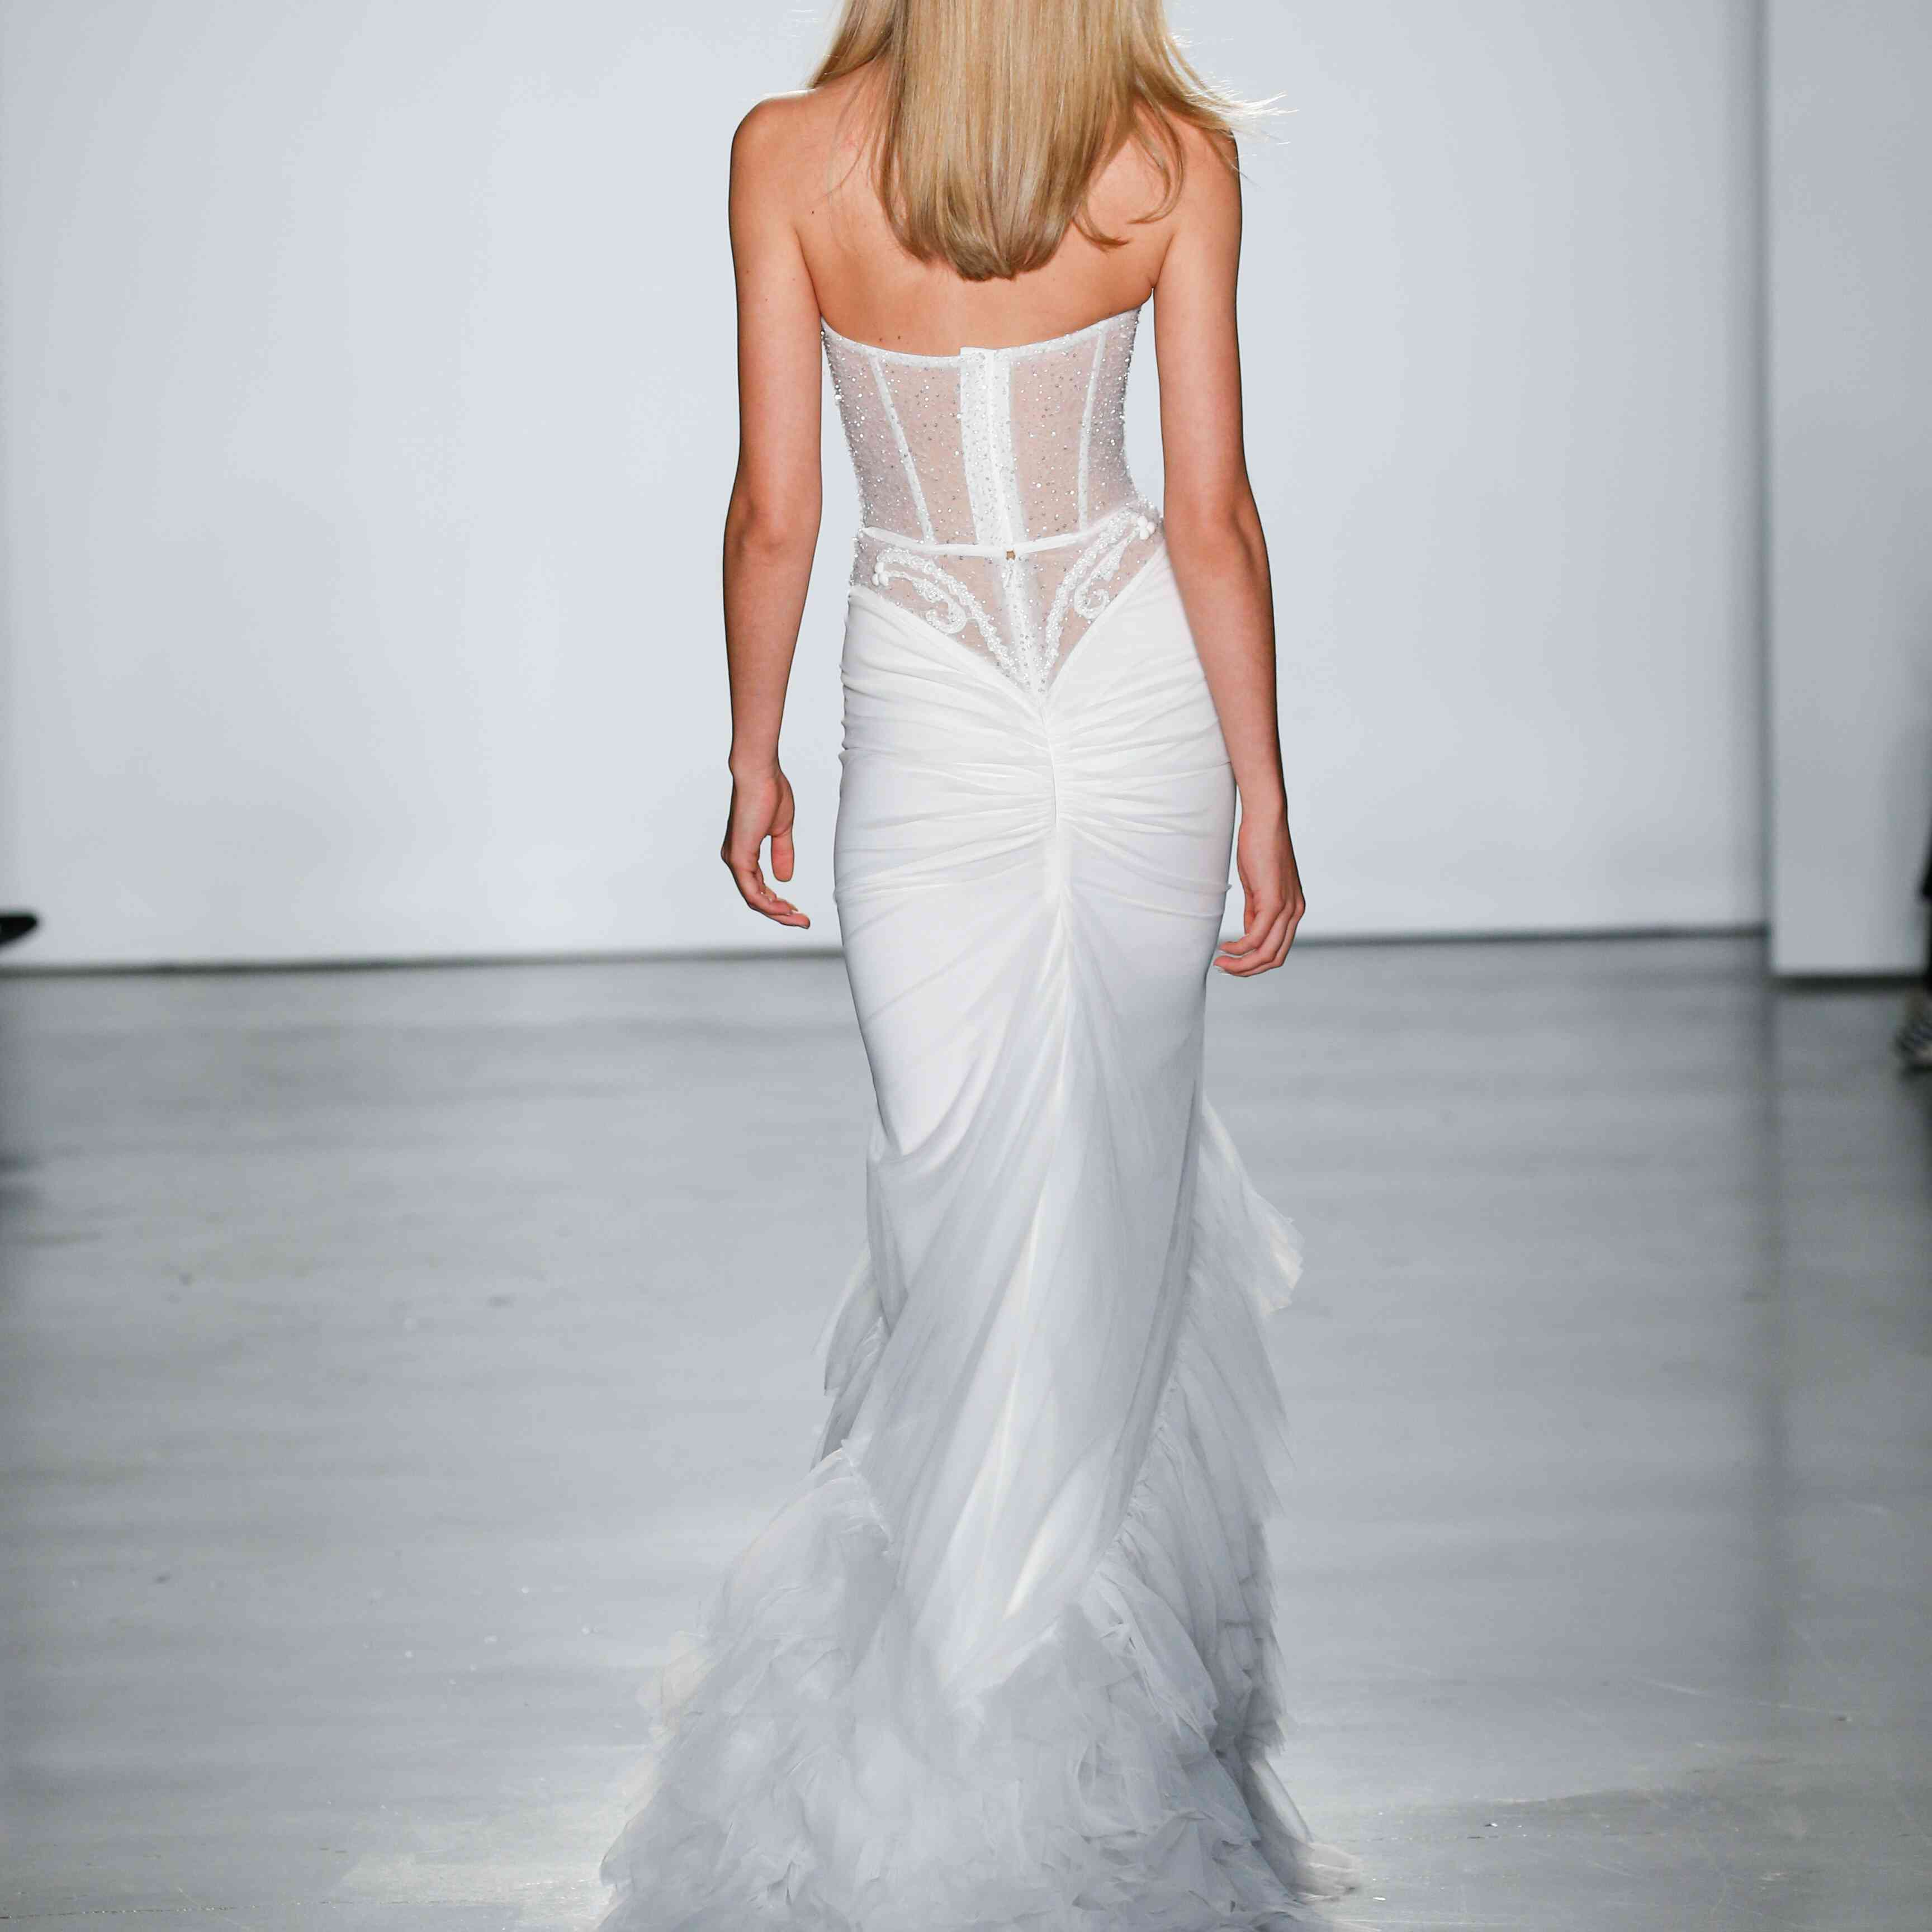 Model in ruffled VIP dress